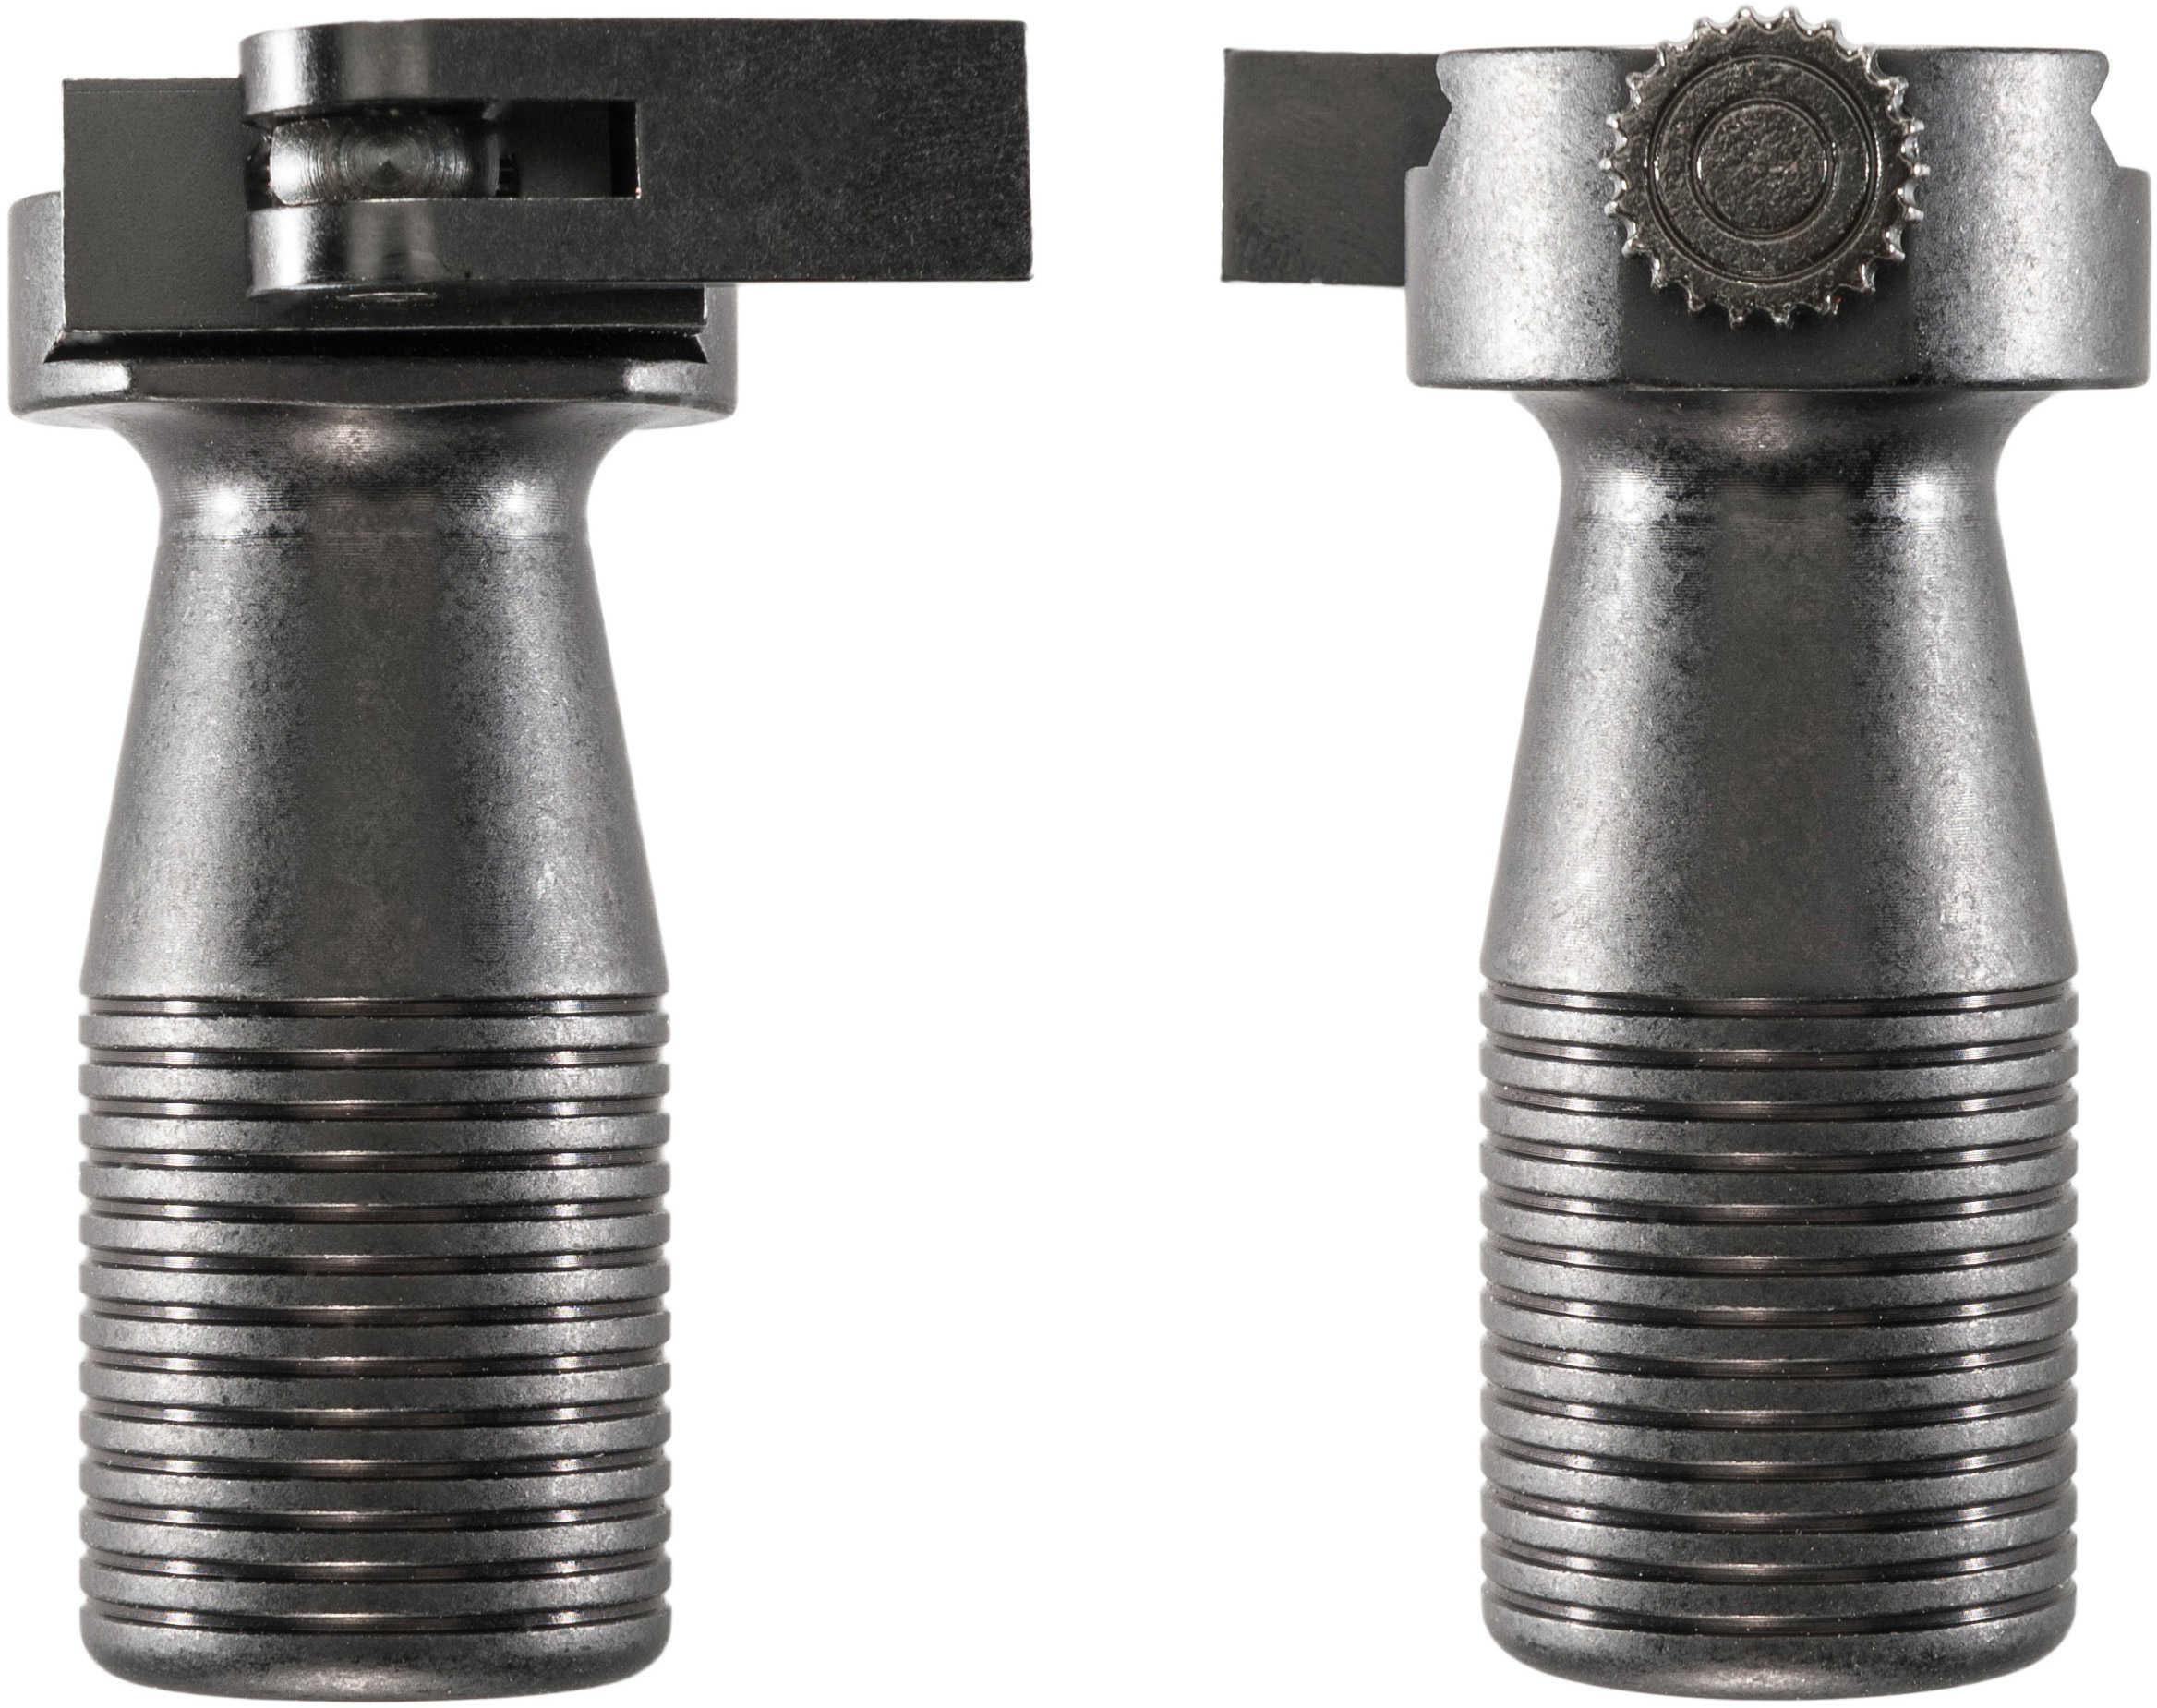 XPRESS Lever Aluminum VFG, Black Mini-Max Md: 4271-Bk